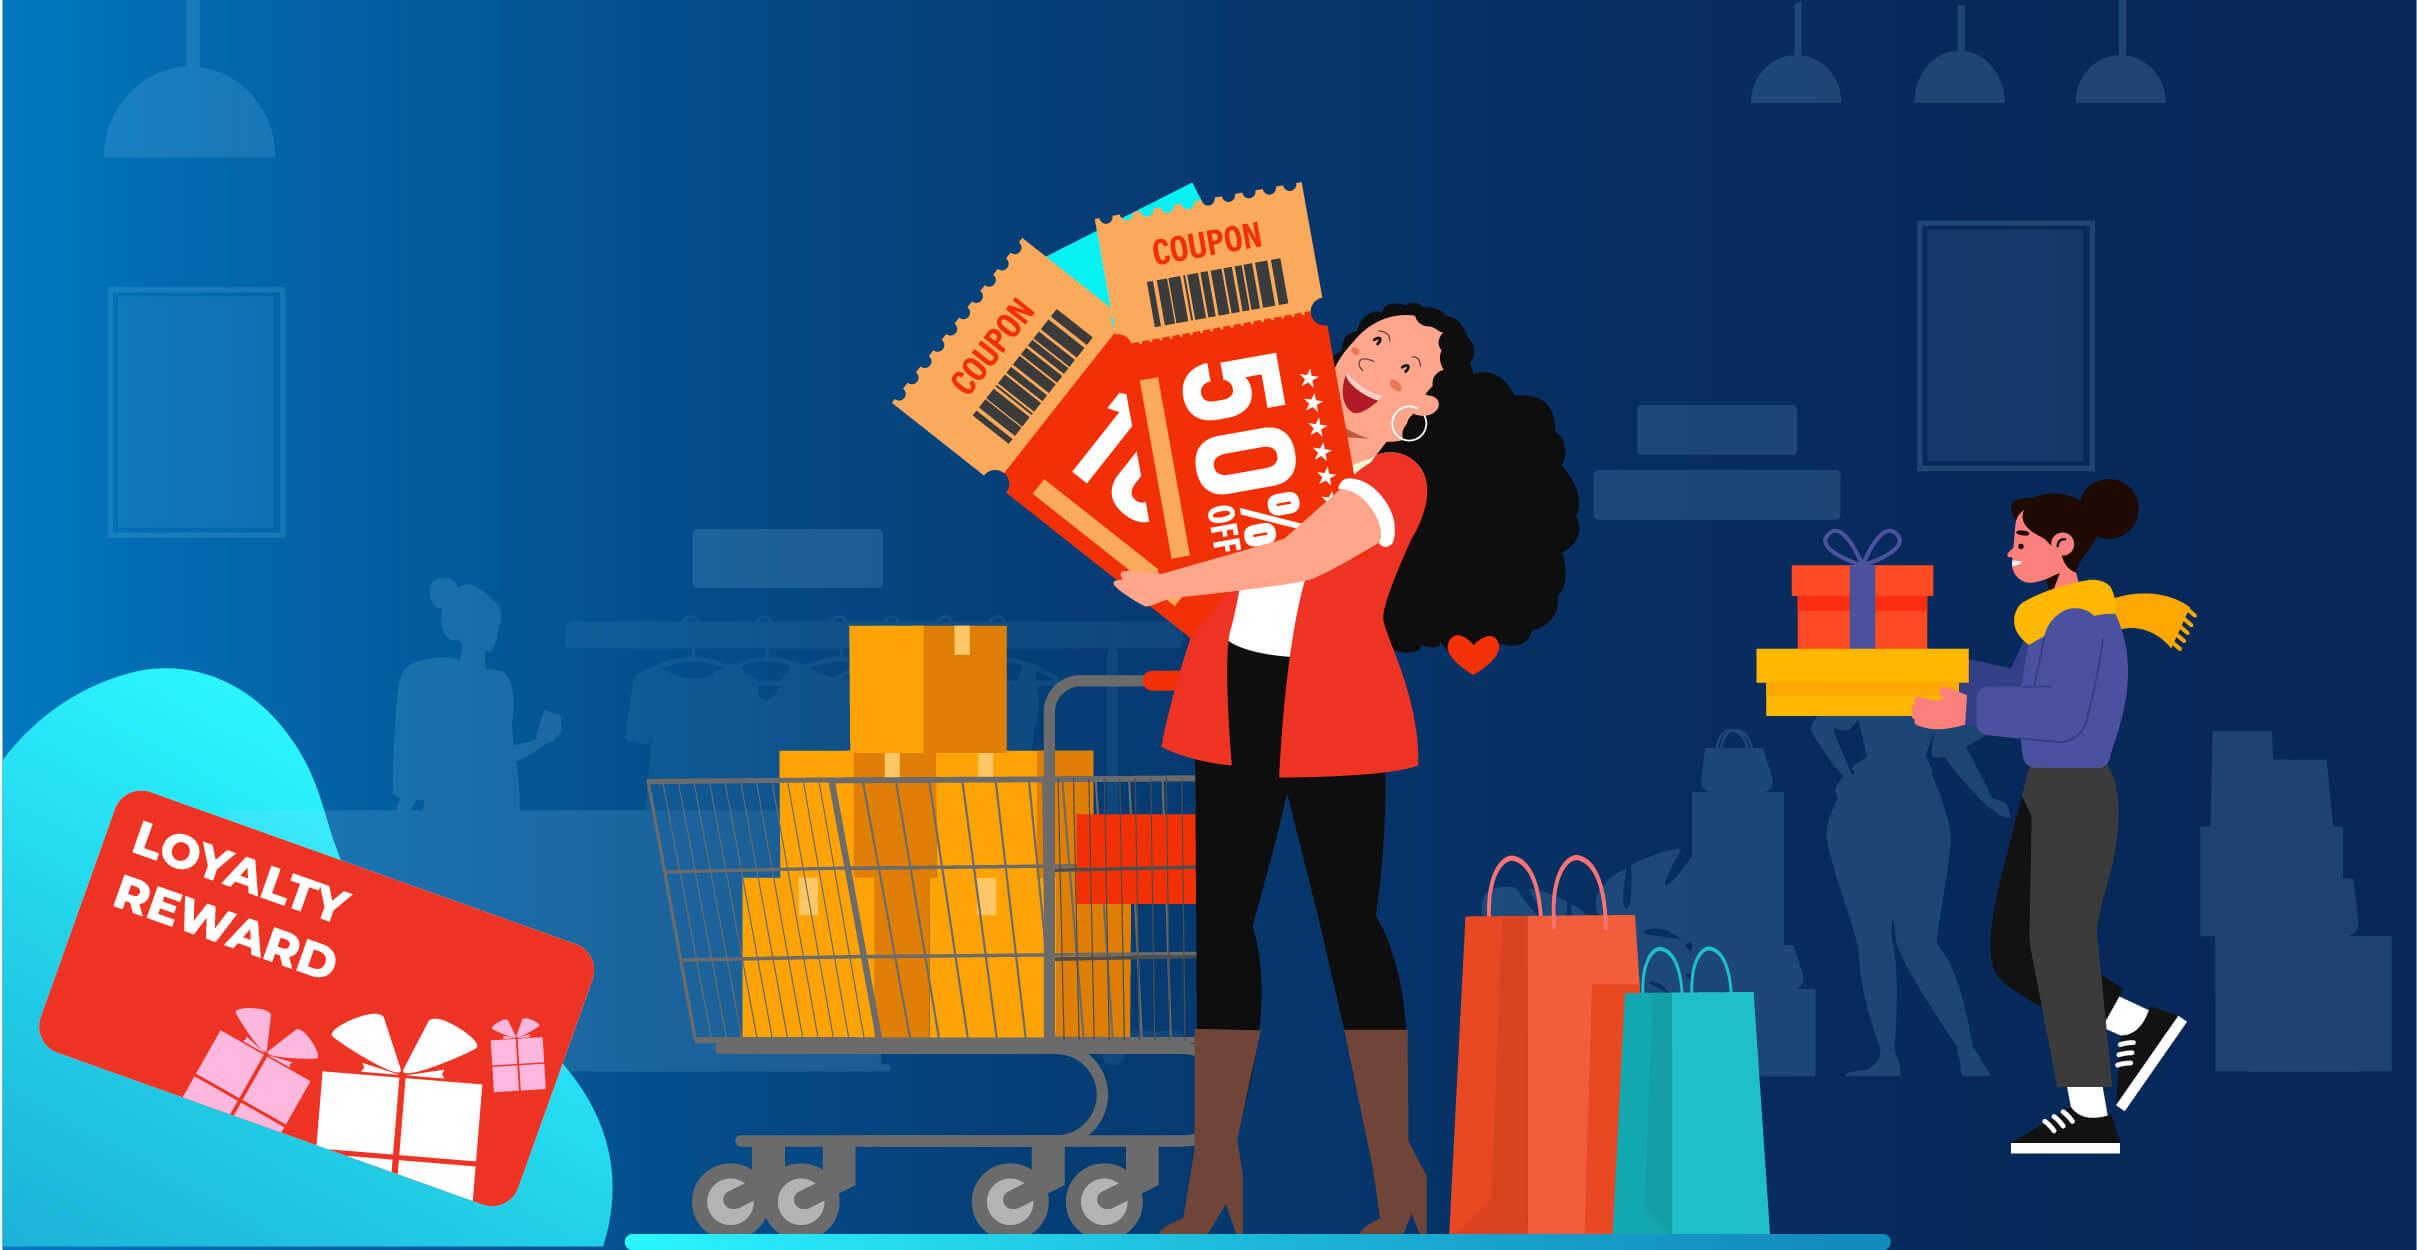 Ftx customer loyalty program in retail industry